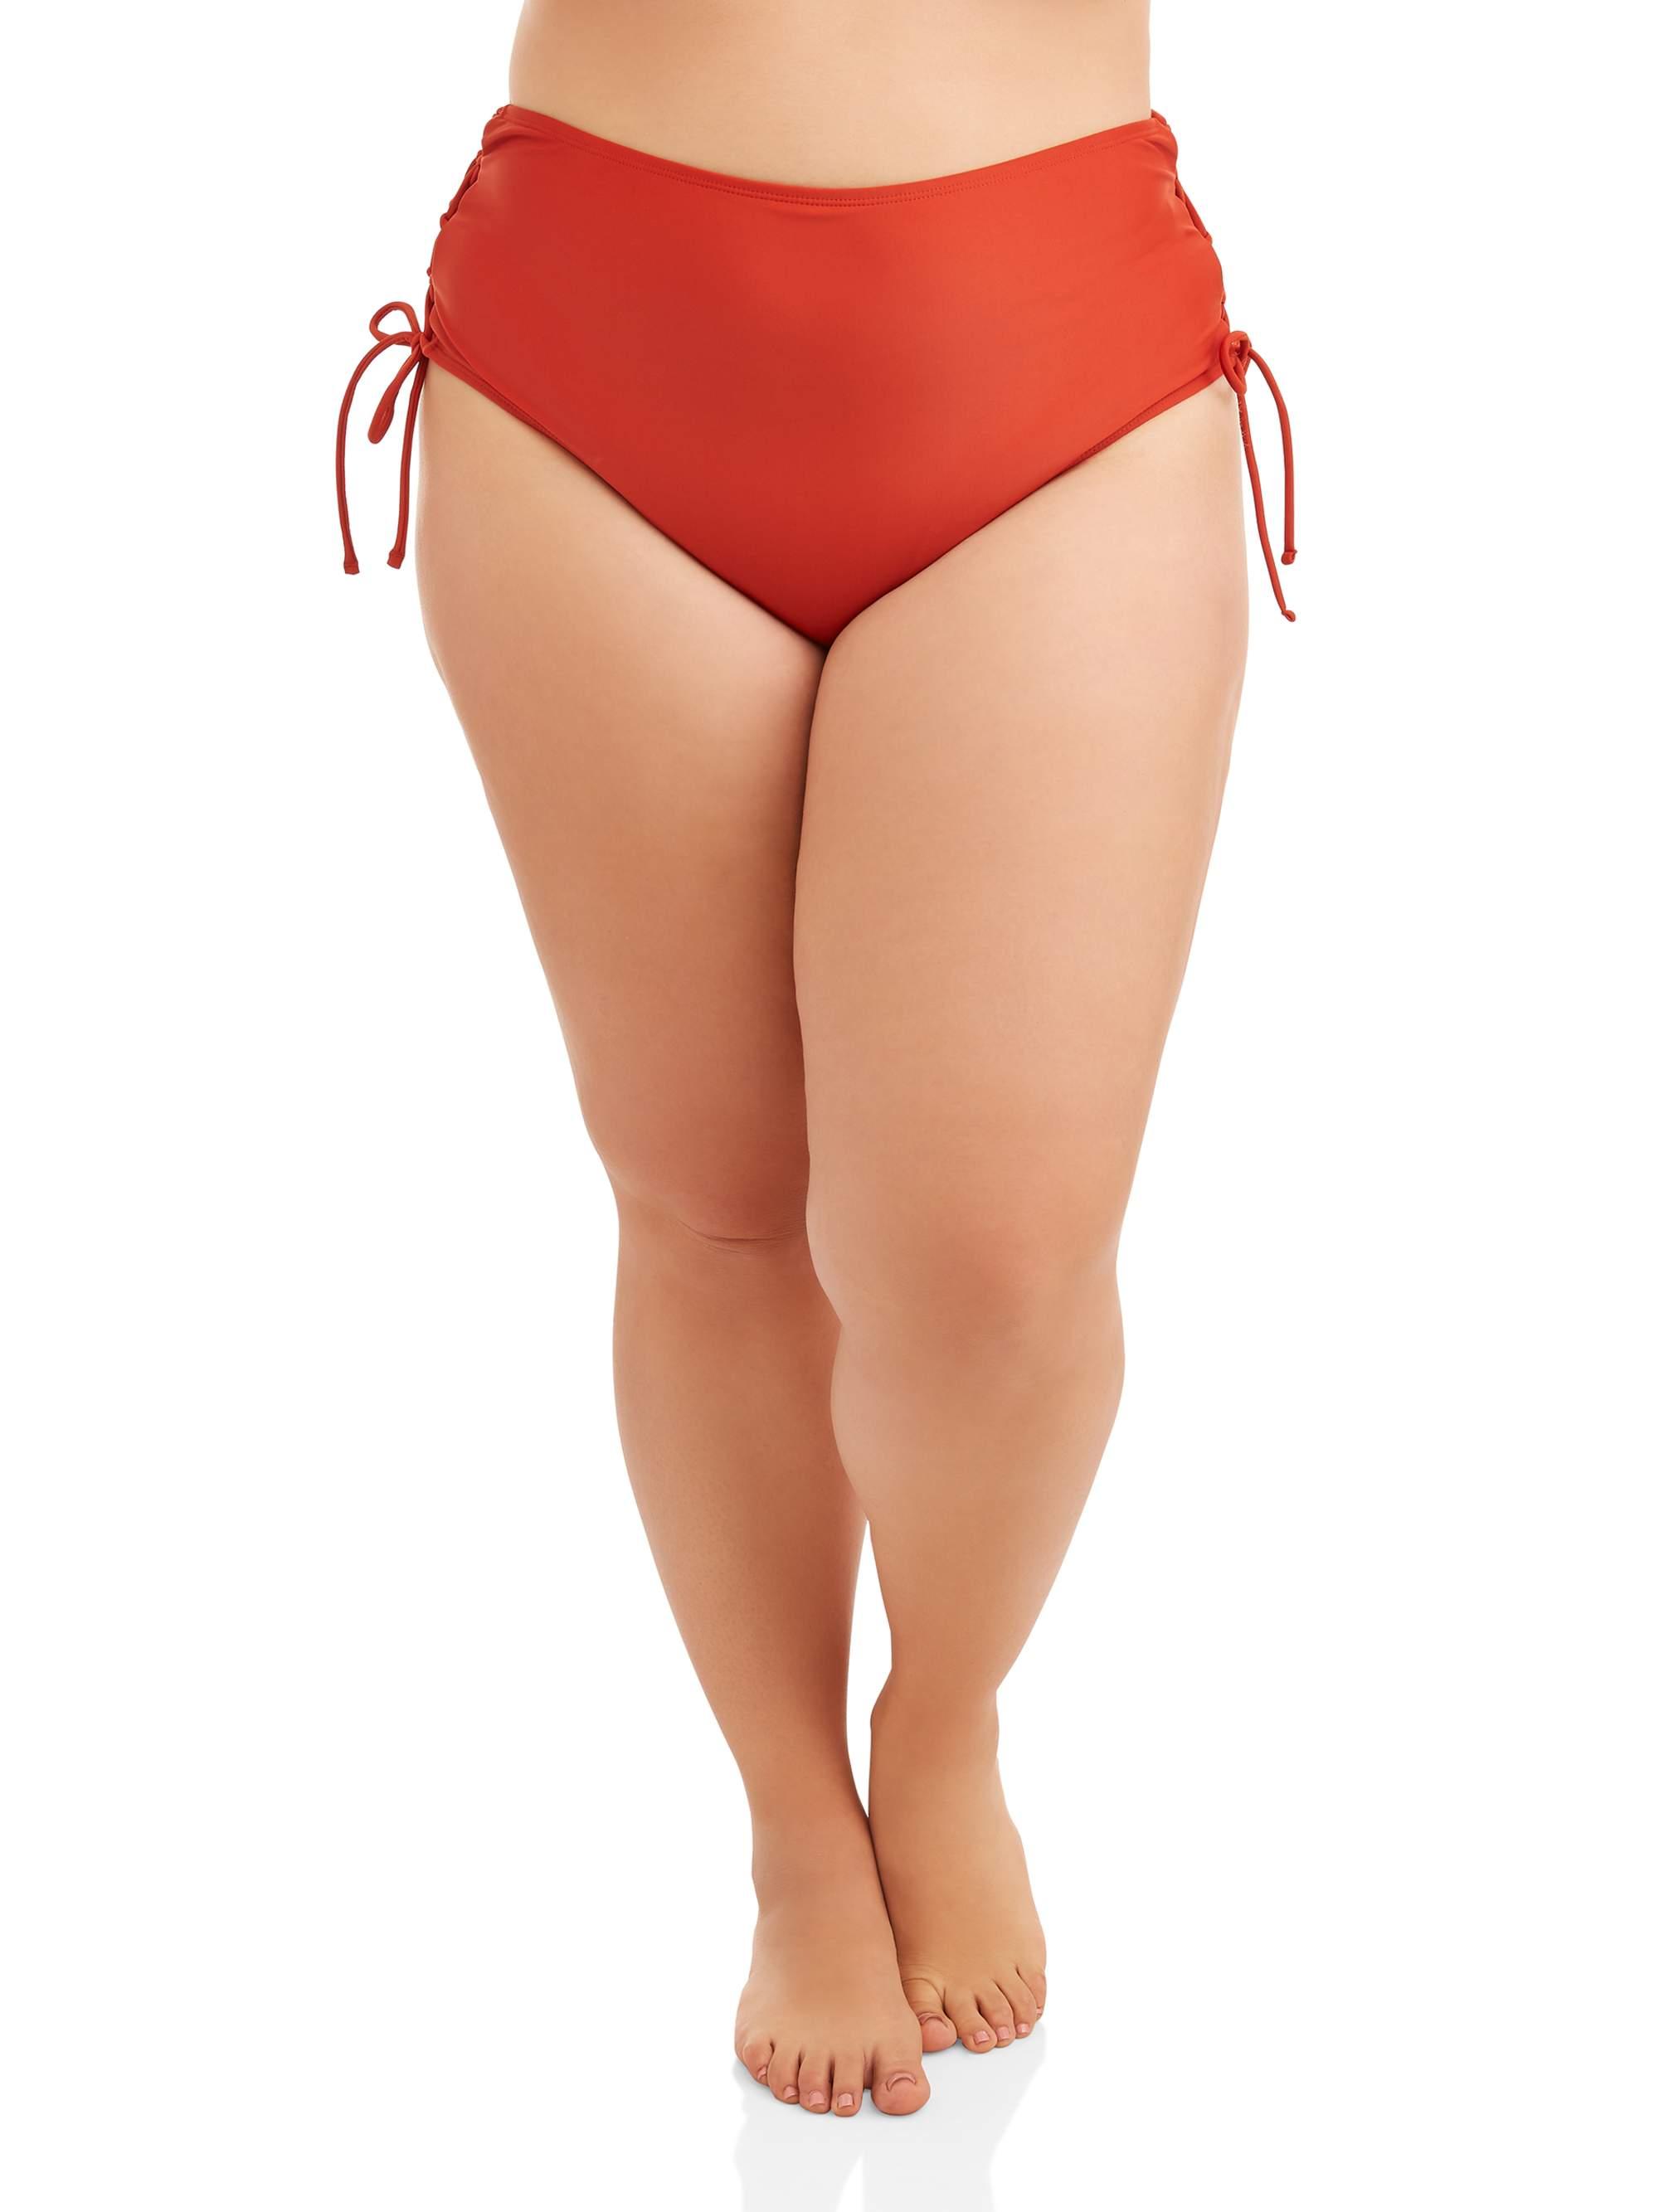 Women's Plus Size Lace Up High Waist Swimsuit Bottom